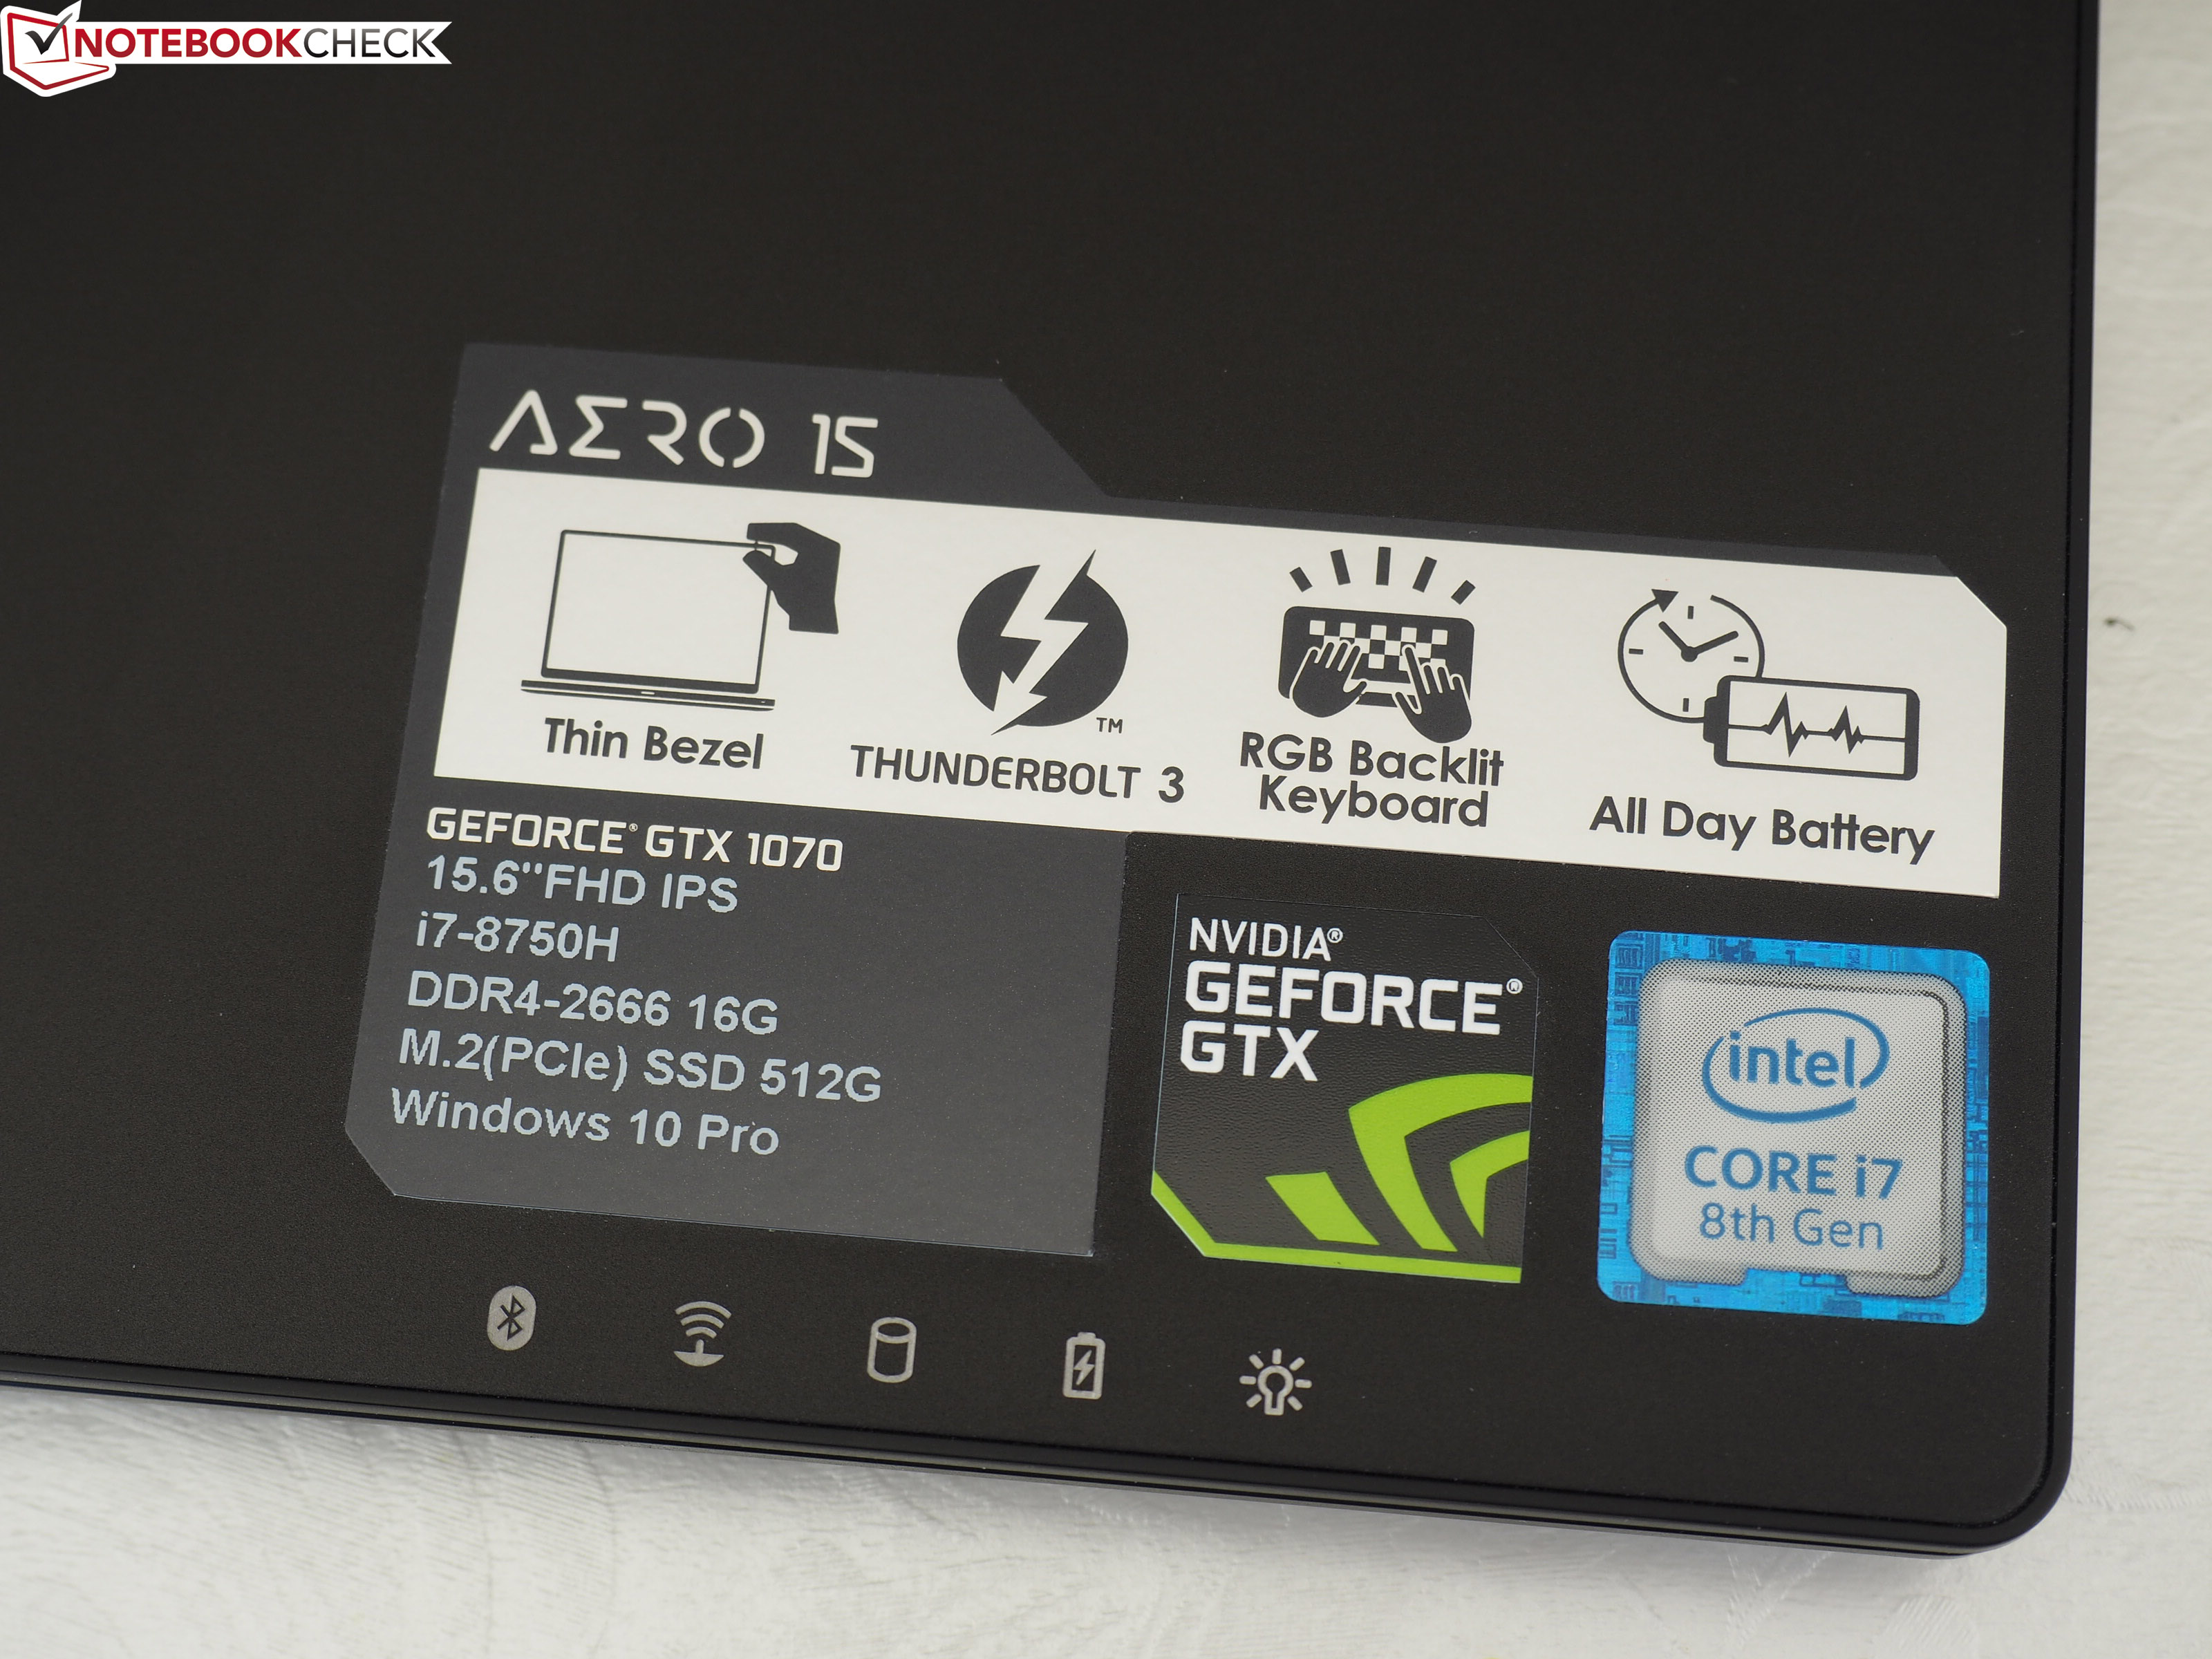 Breve Anlise Do Porttil Gigabyte Aero 15x V8 I7 8750h Gtx 1070 Dell Xps 15 9570 16gb 512gb 1050ti Win10 Pro 156 4k Full Resolution